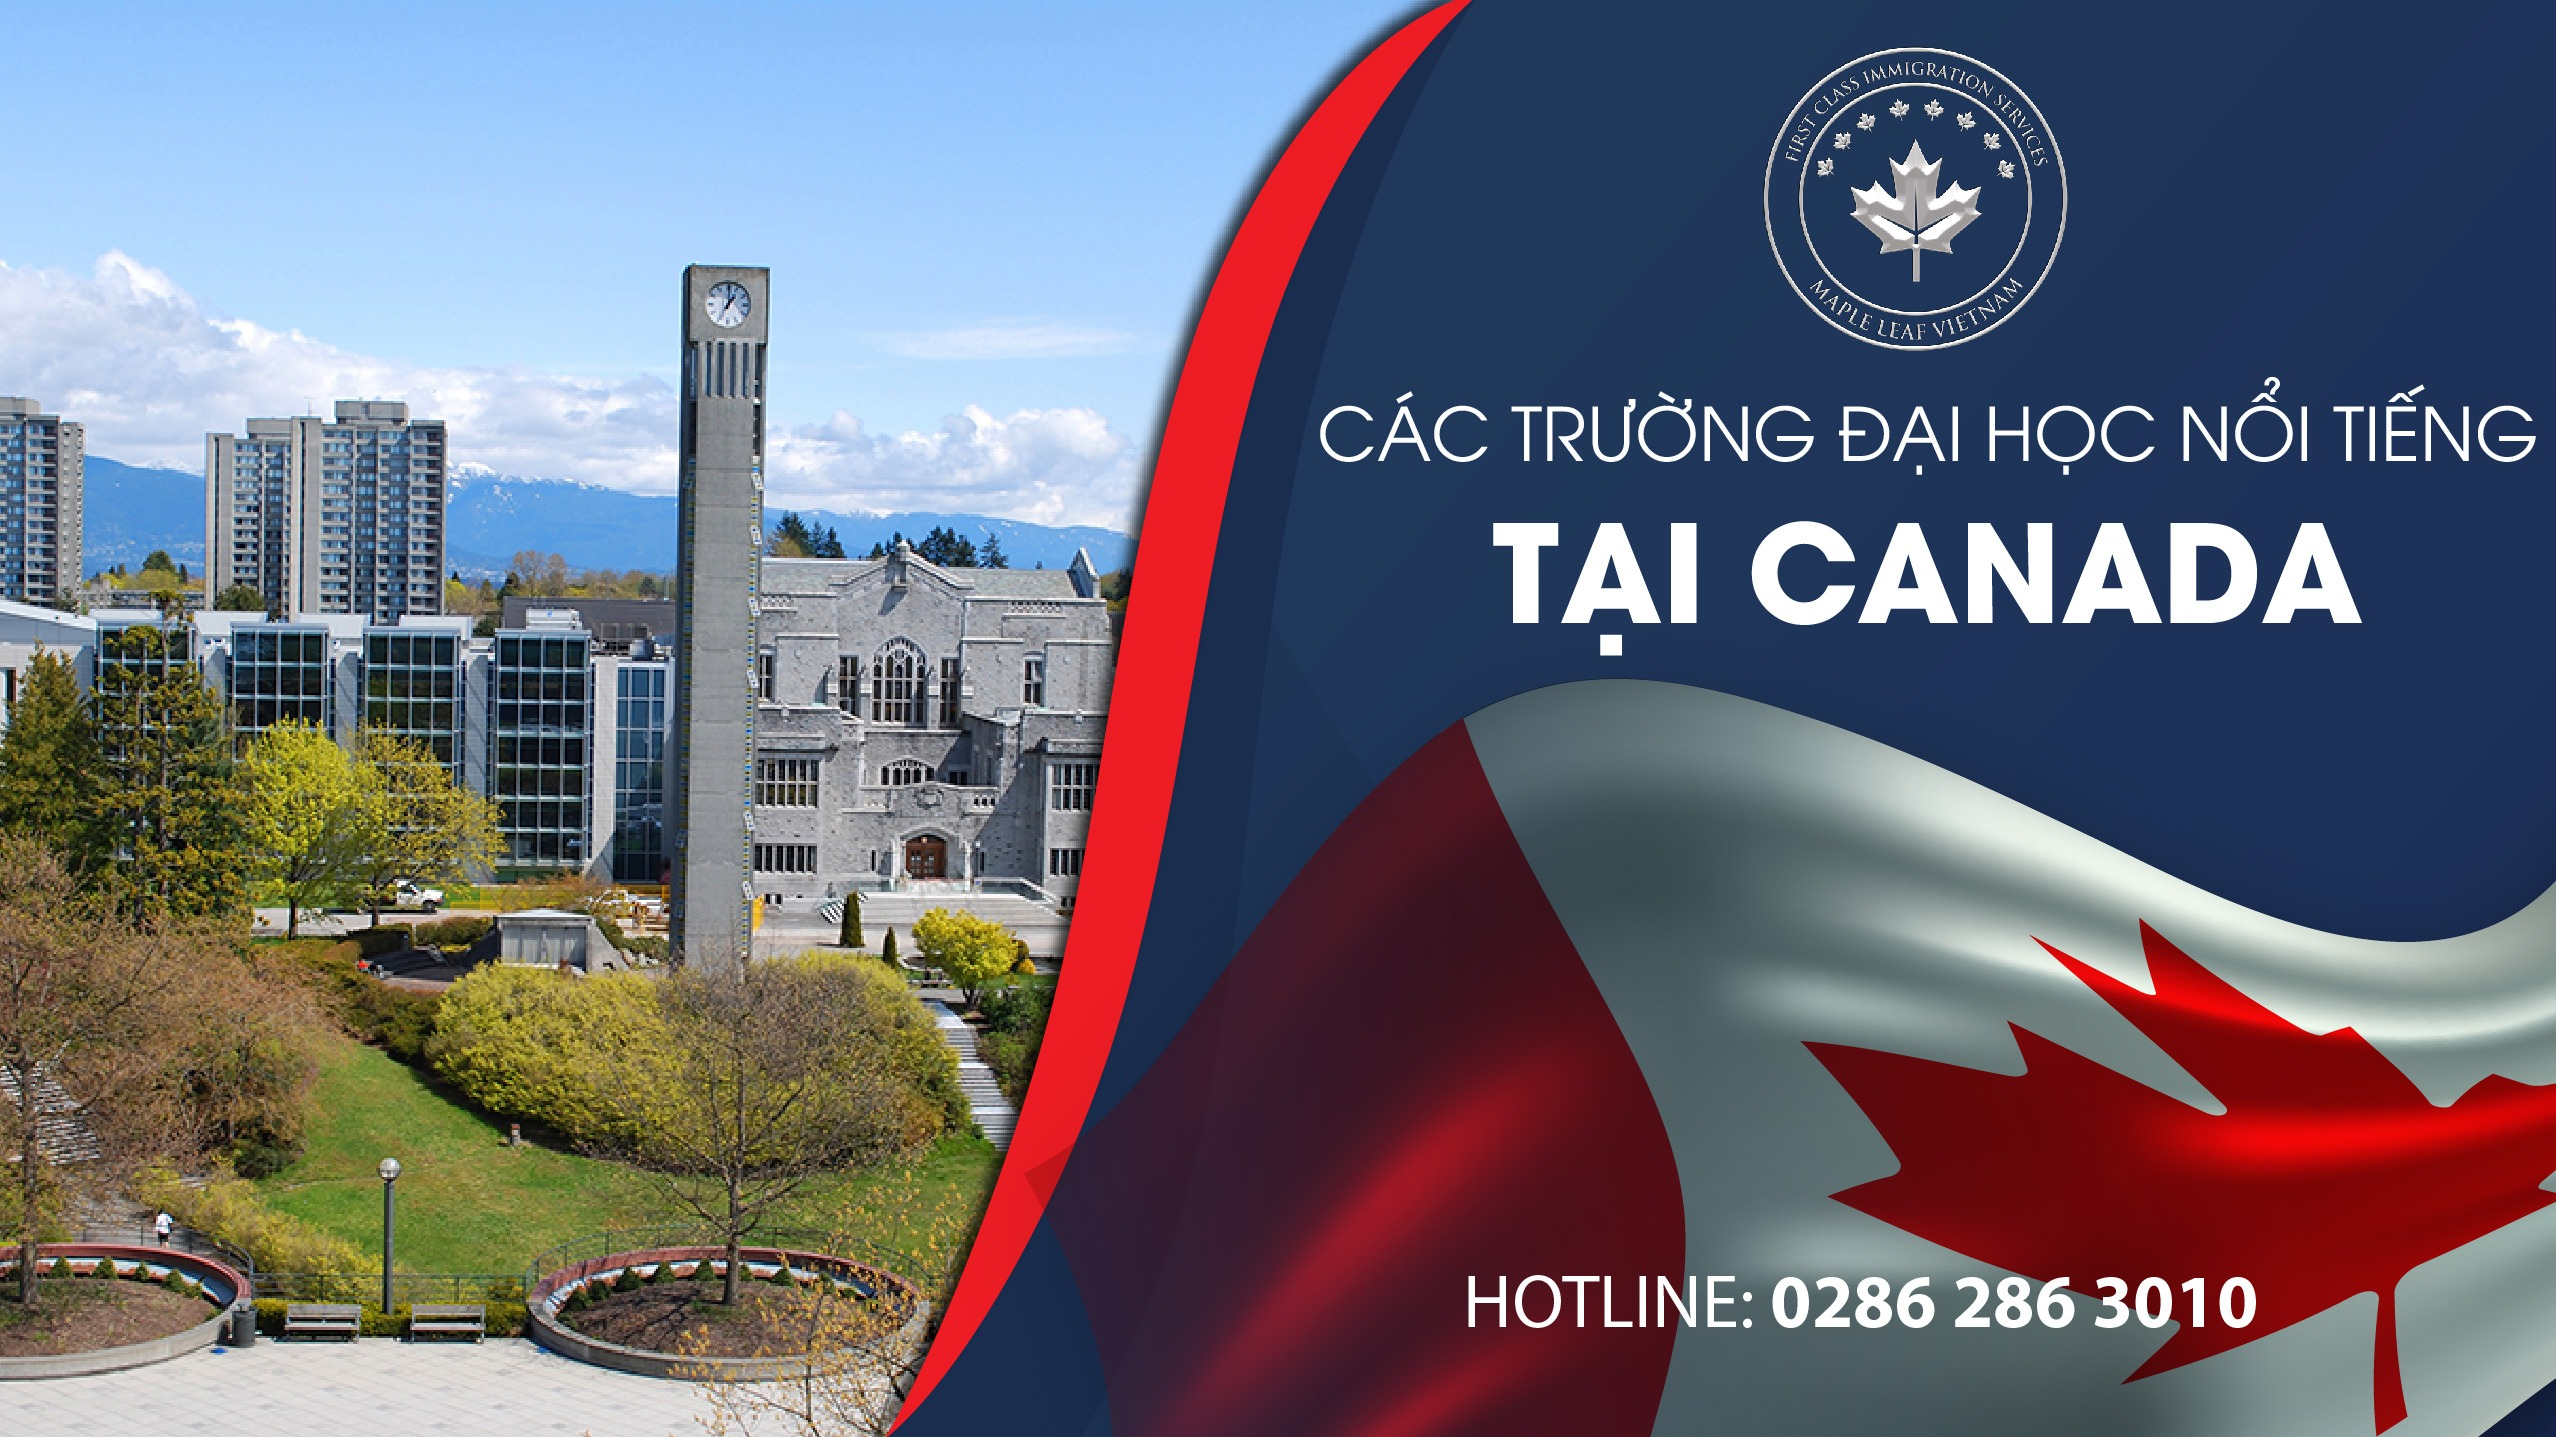 cac-truong-dai-hoc-noi-tieng-tai-canada